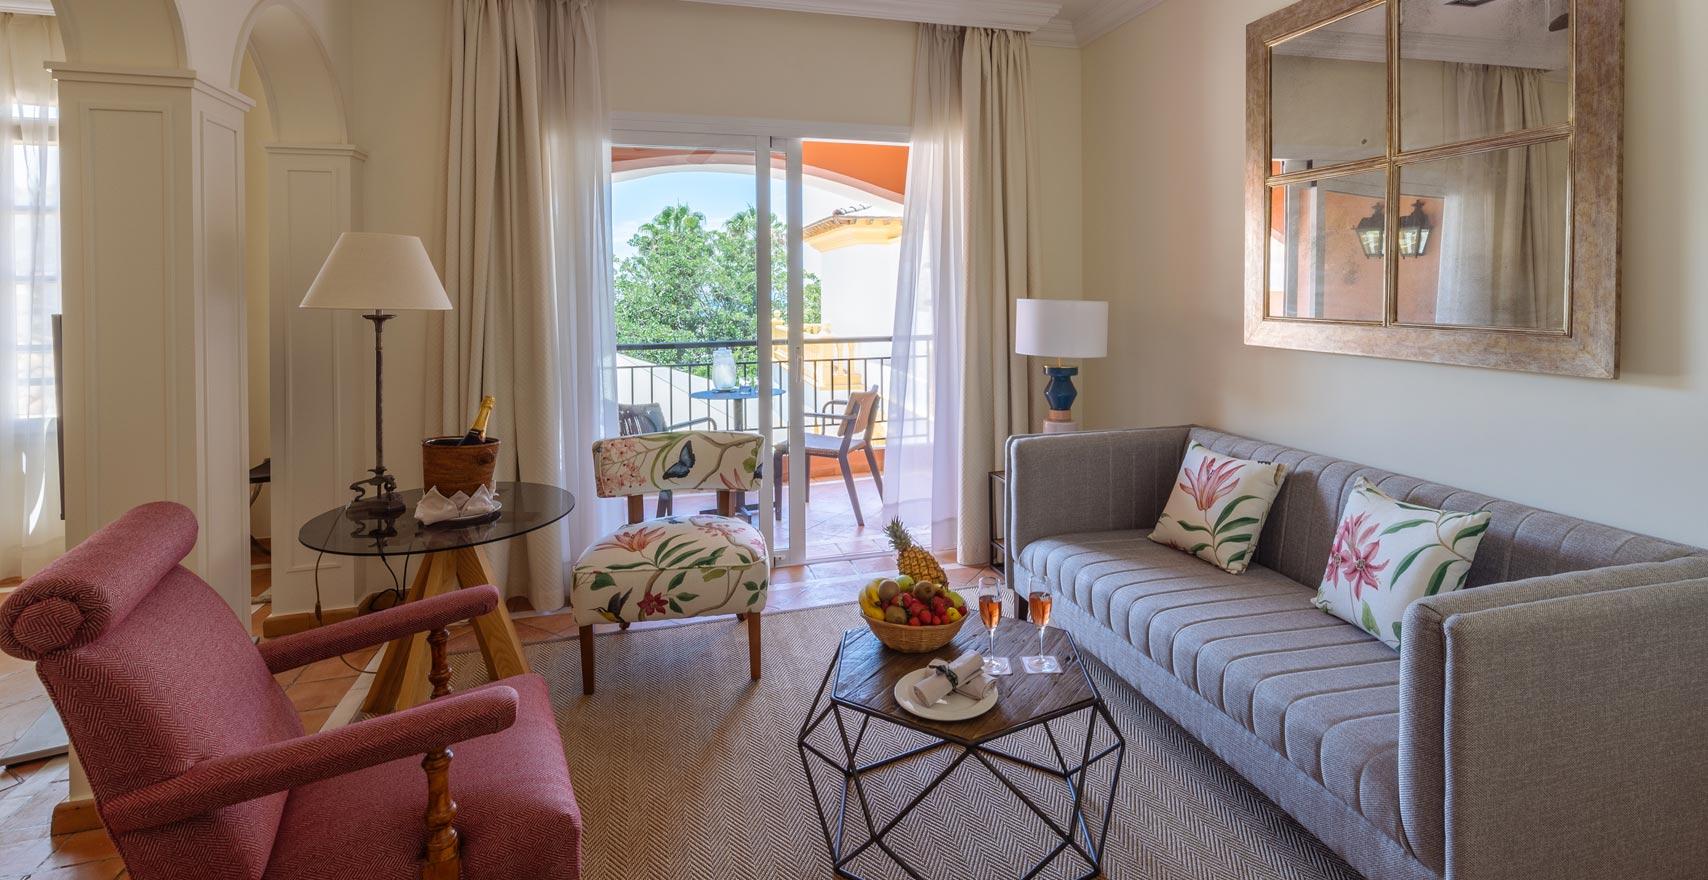 Junior Suite Casas Ducales living room